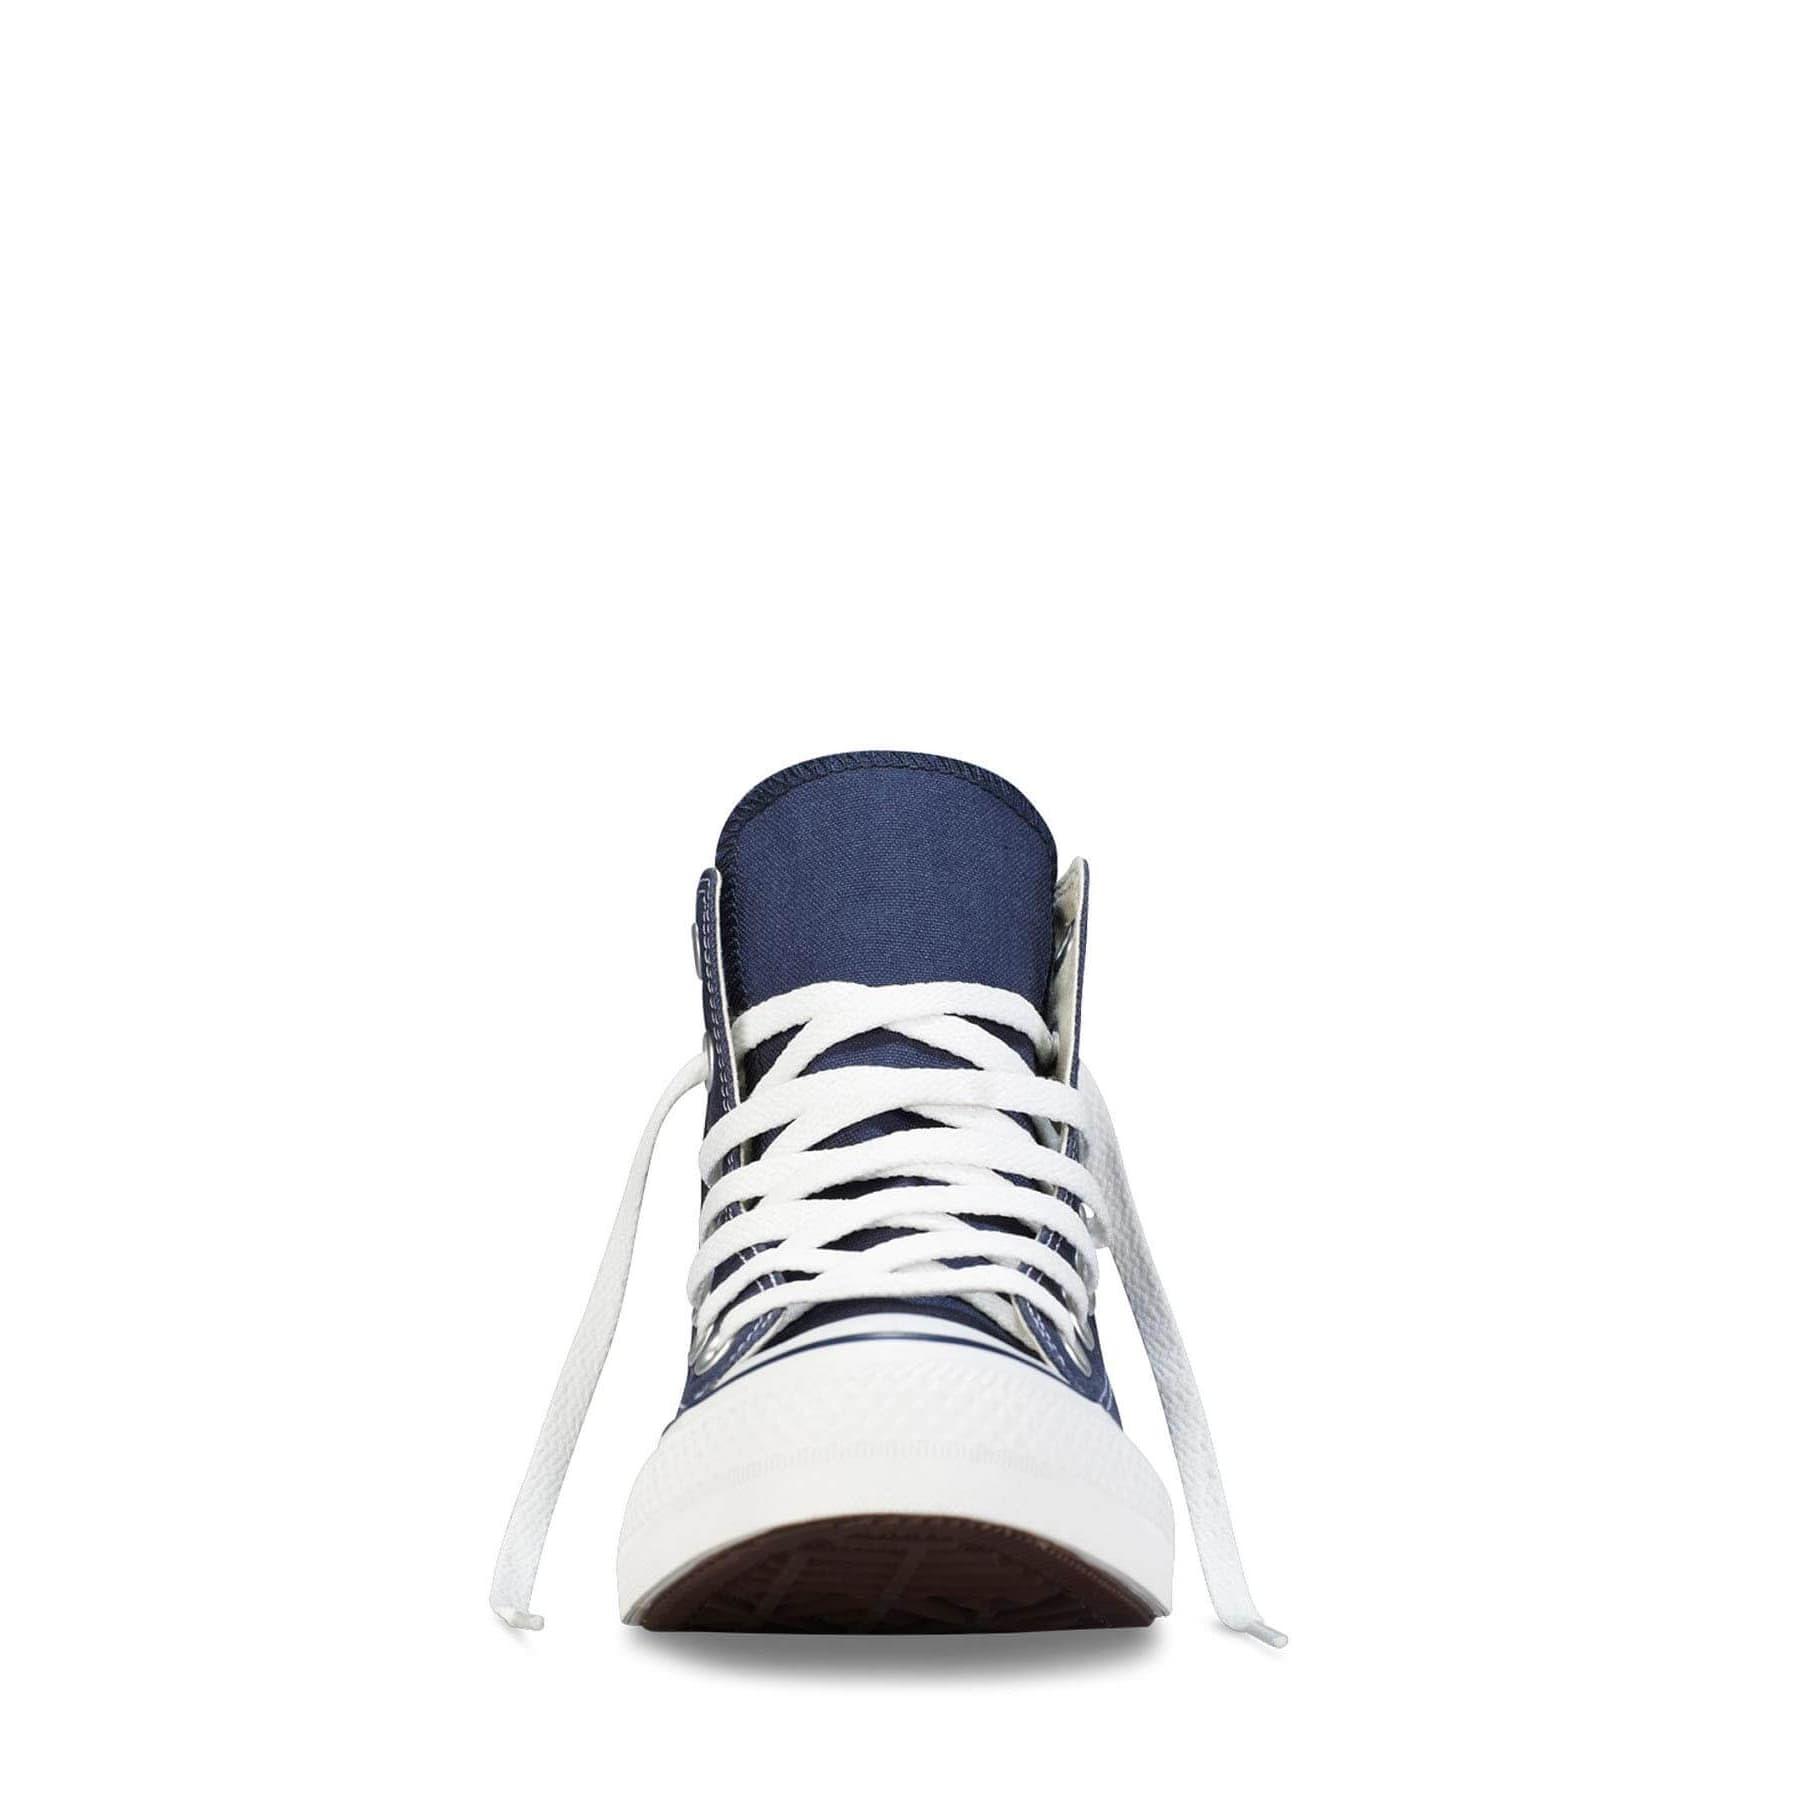 Chuck Taylor All Star Lacivert Spor Ayakkabı (M9622C)